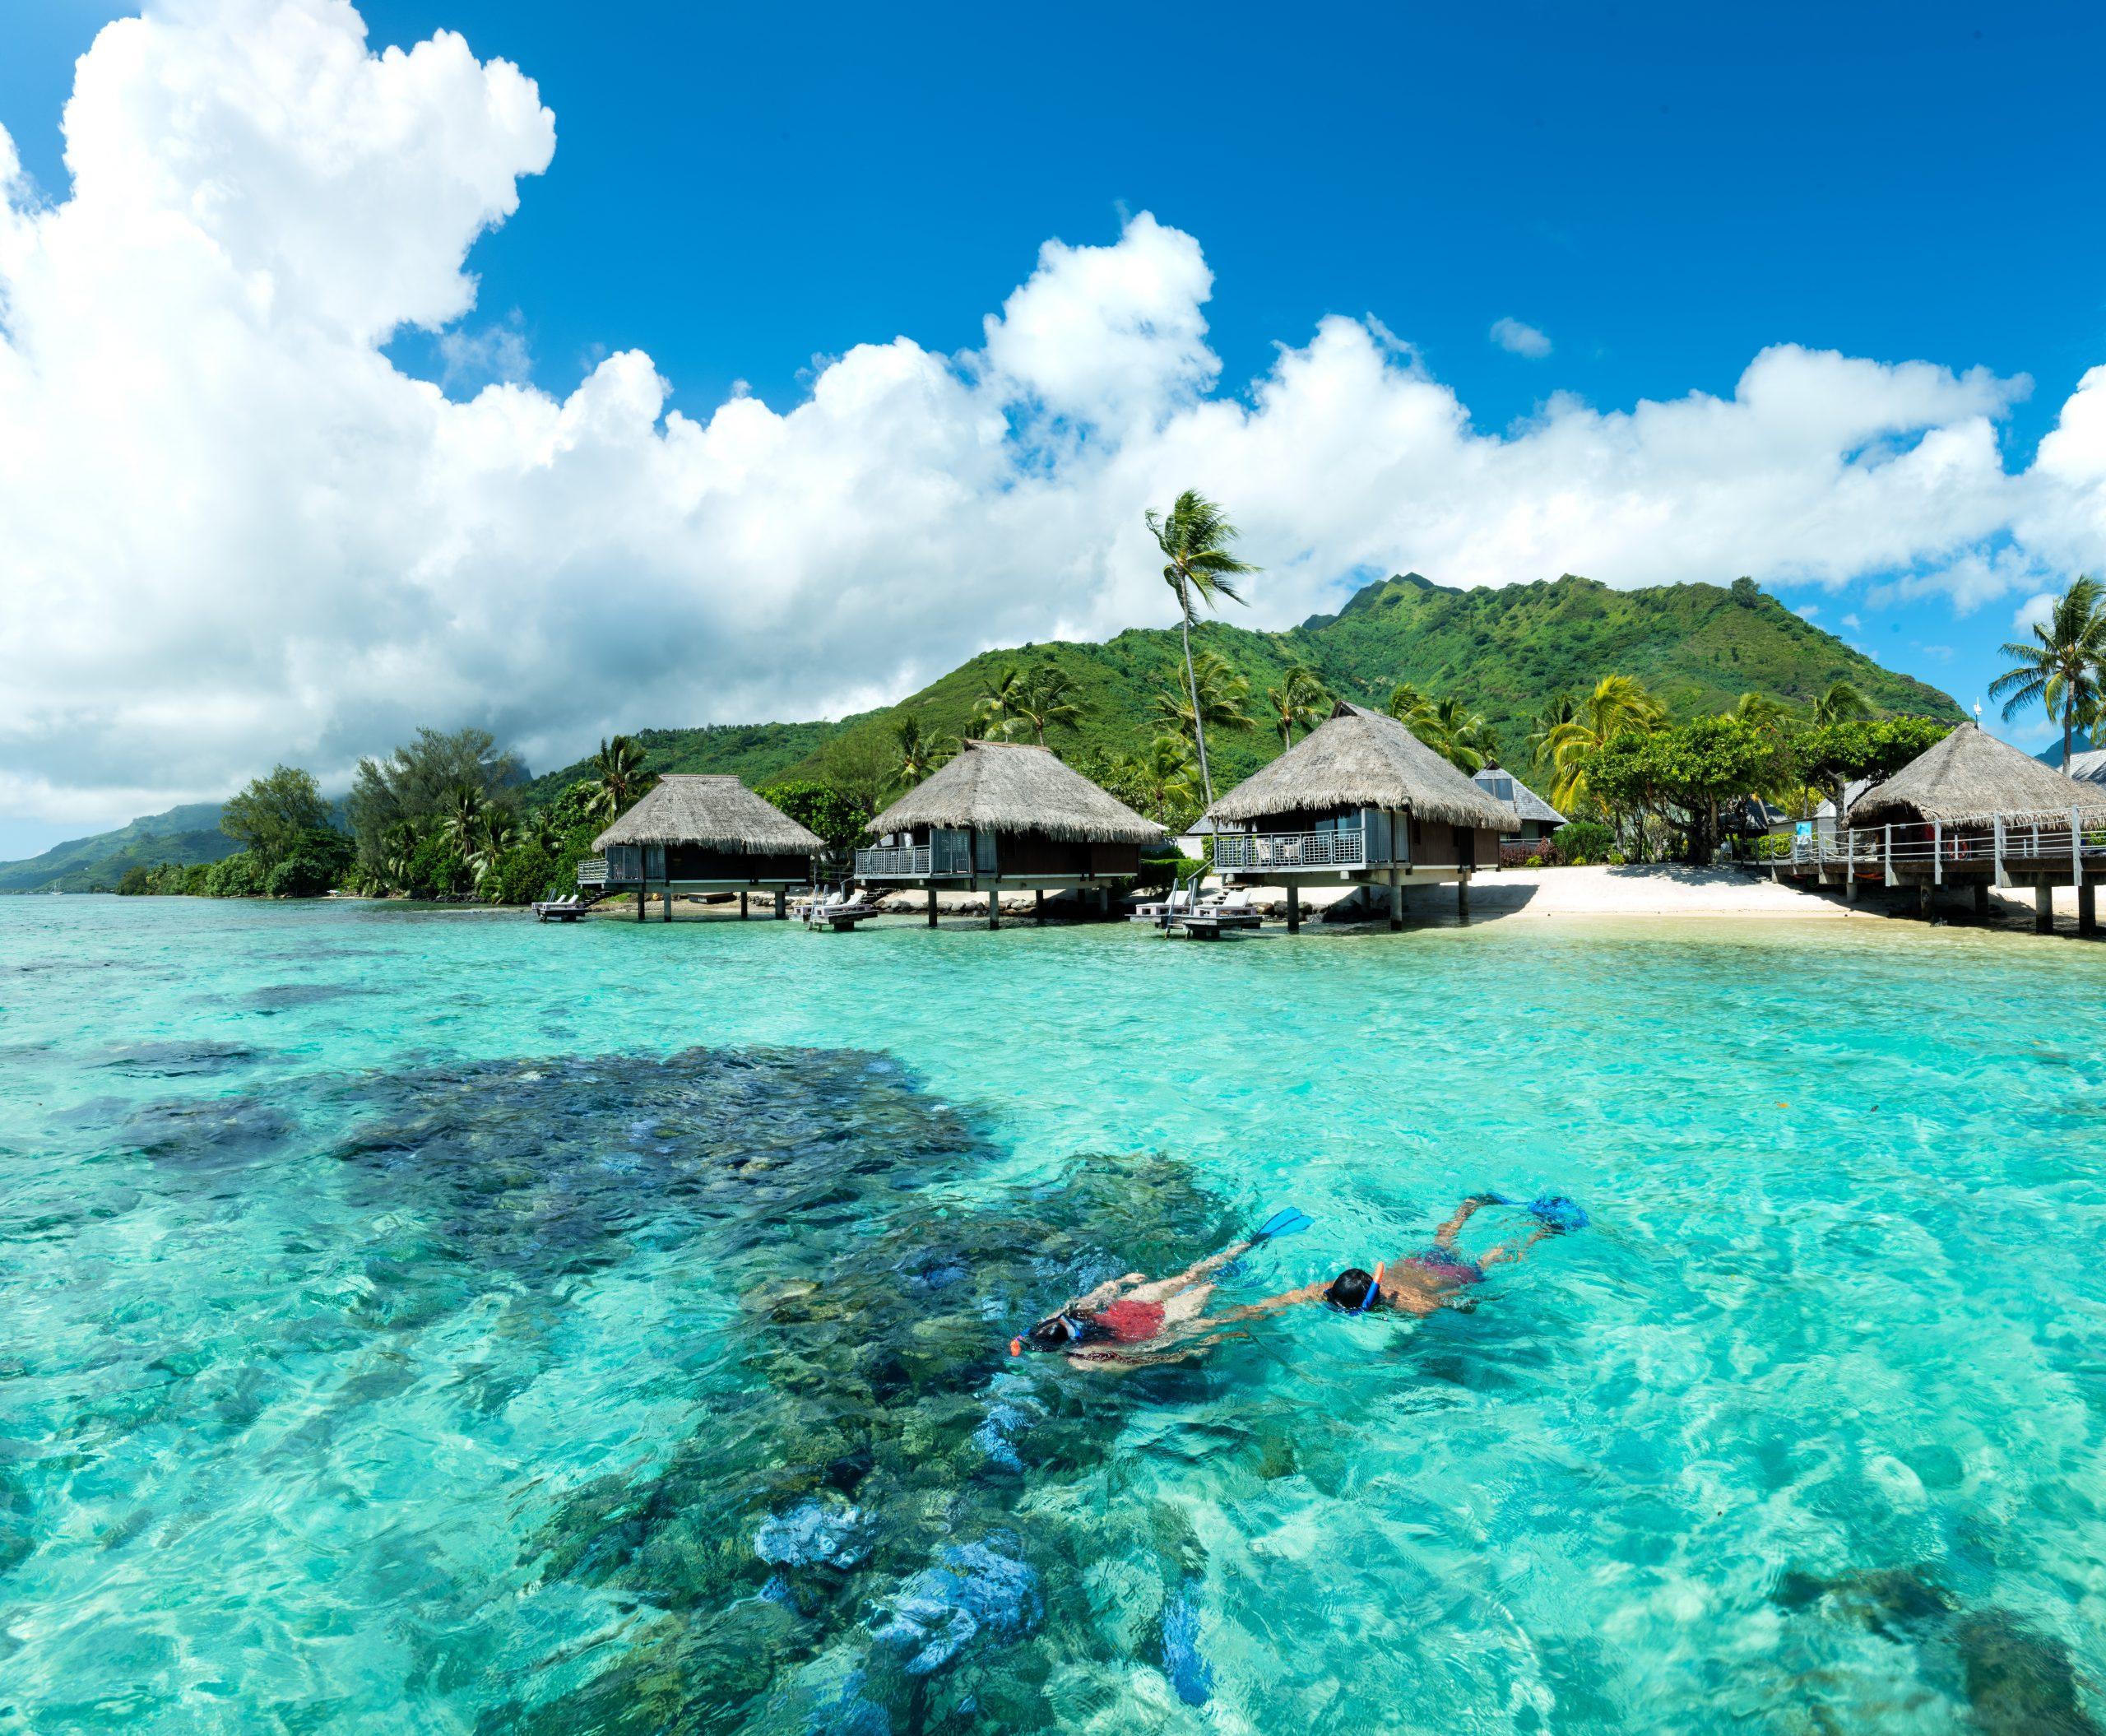 https://tahititourisme.com/wp-content/uploads/2021/05/HLMR-Lagoon-Bungalows-scaled.jpg